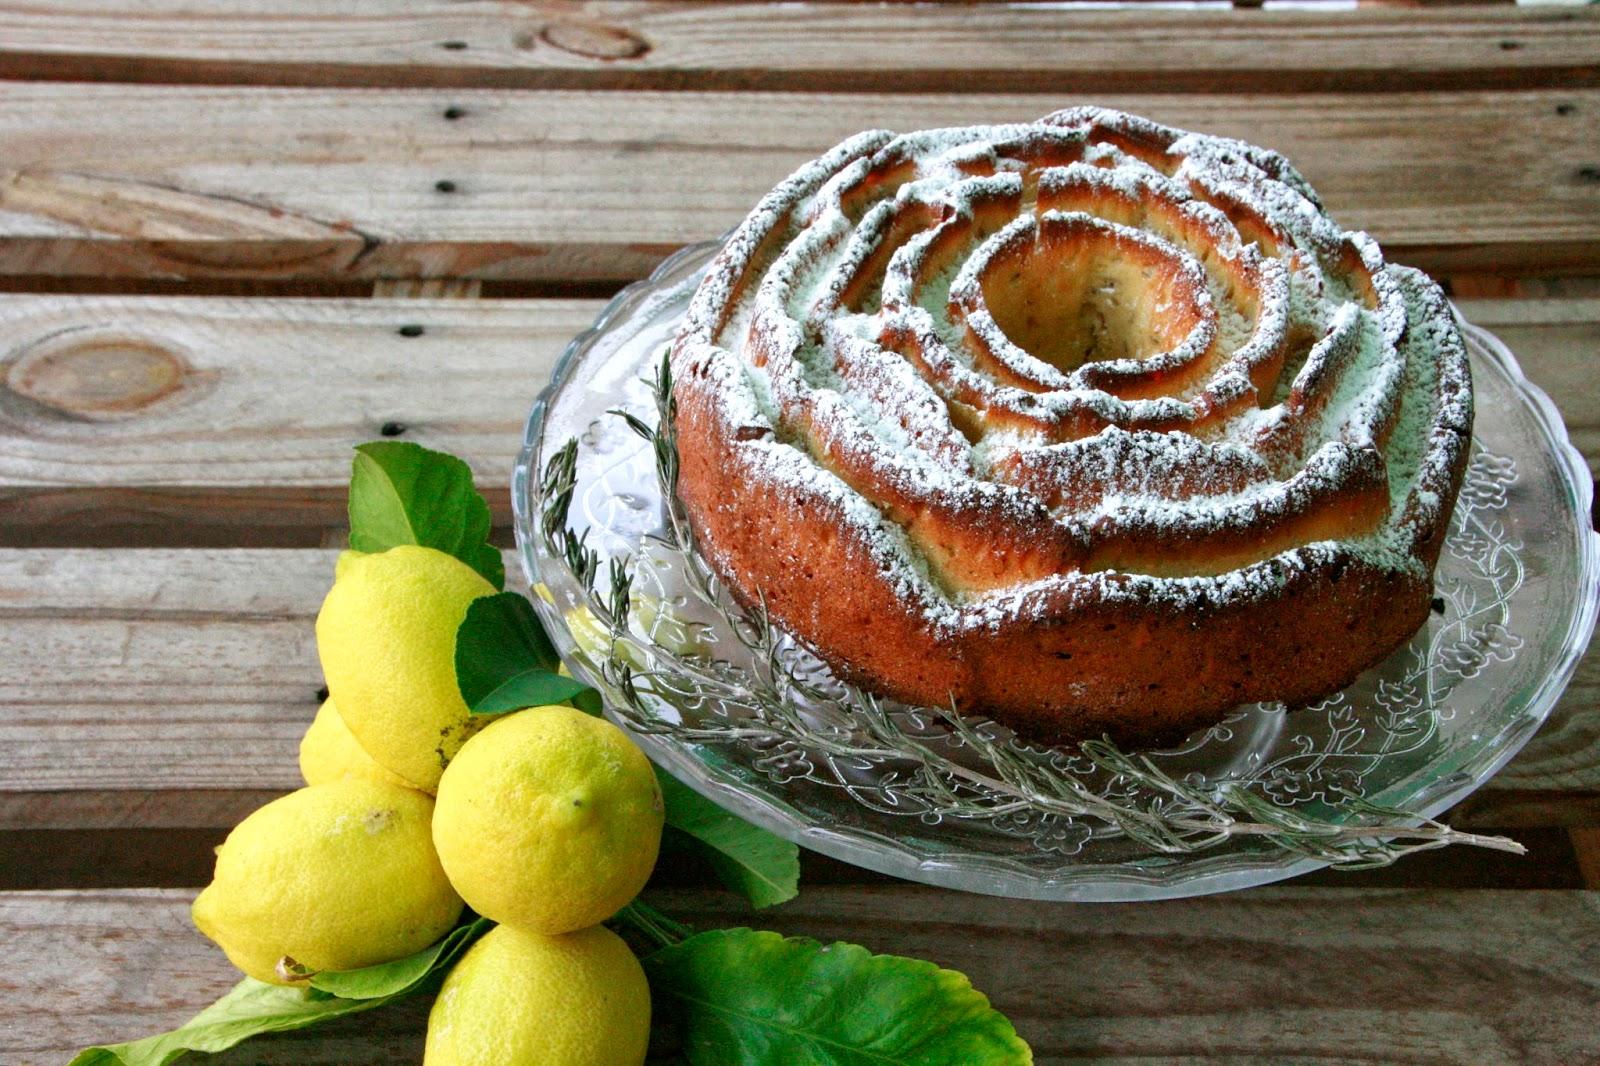 un bon bundt cake de llimona i romani per esmorzar